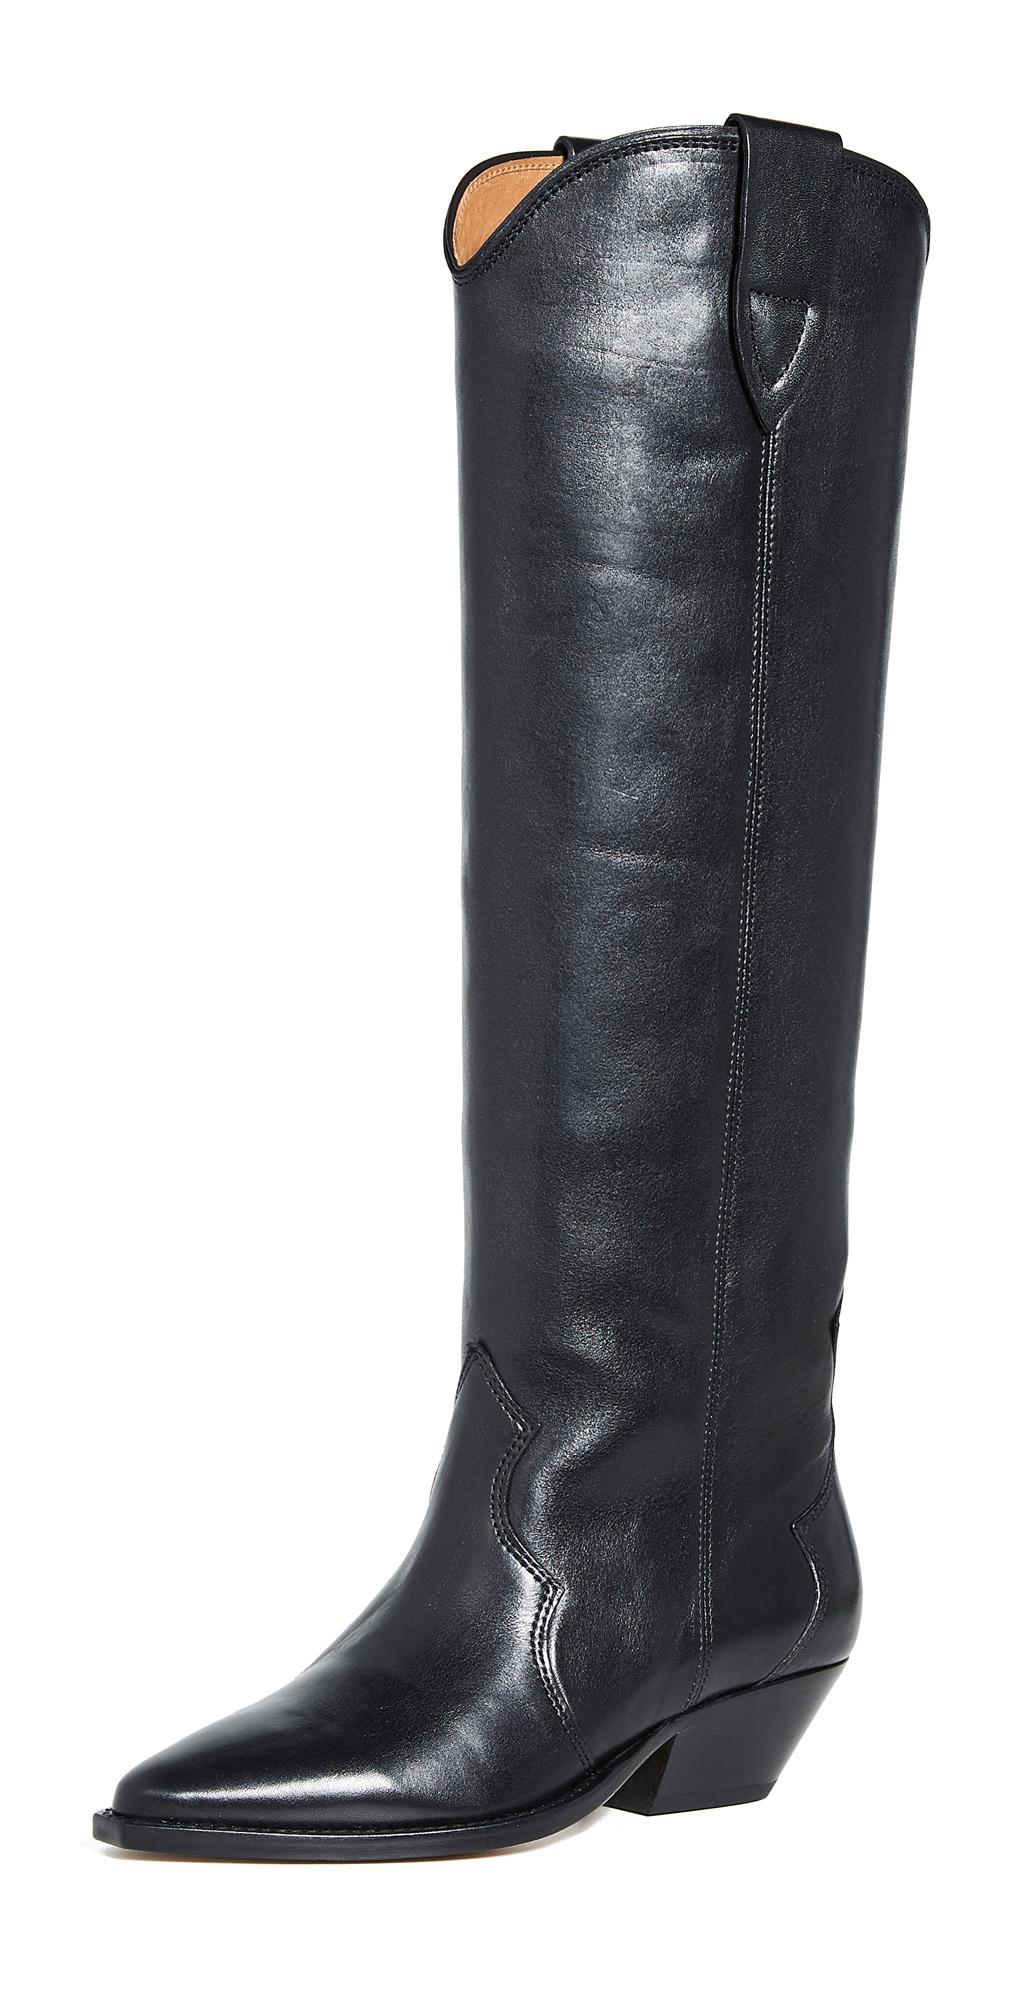 Isabel Marant Denvee Tall Boots